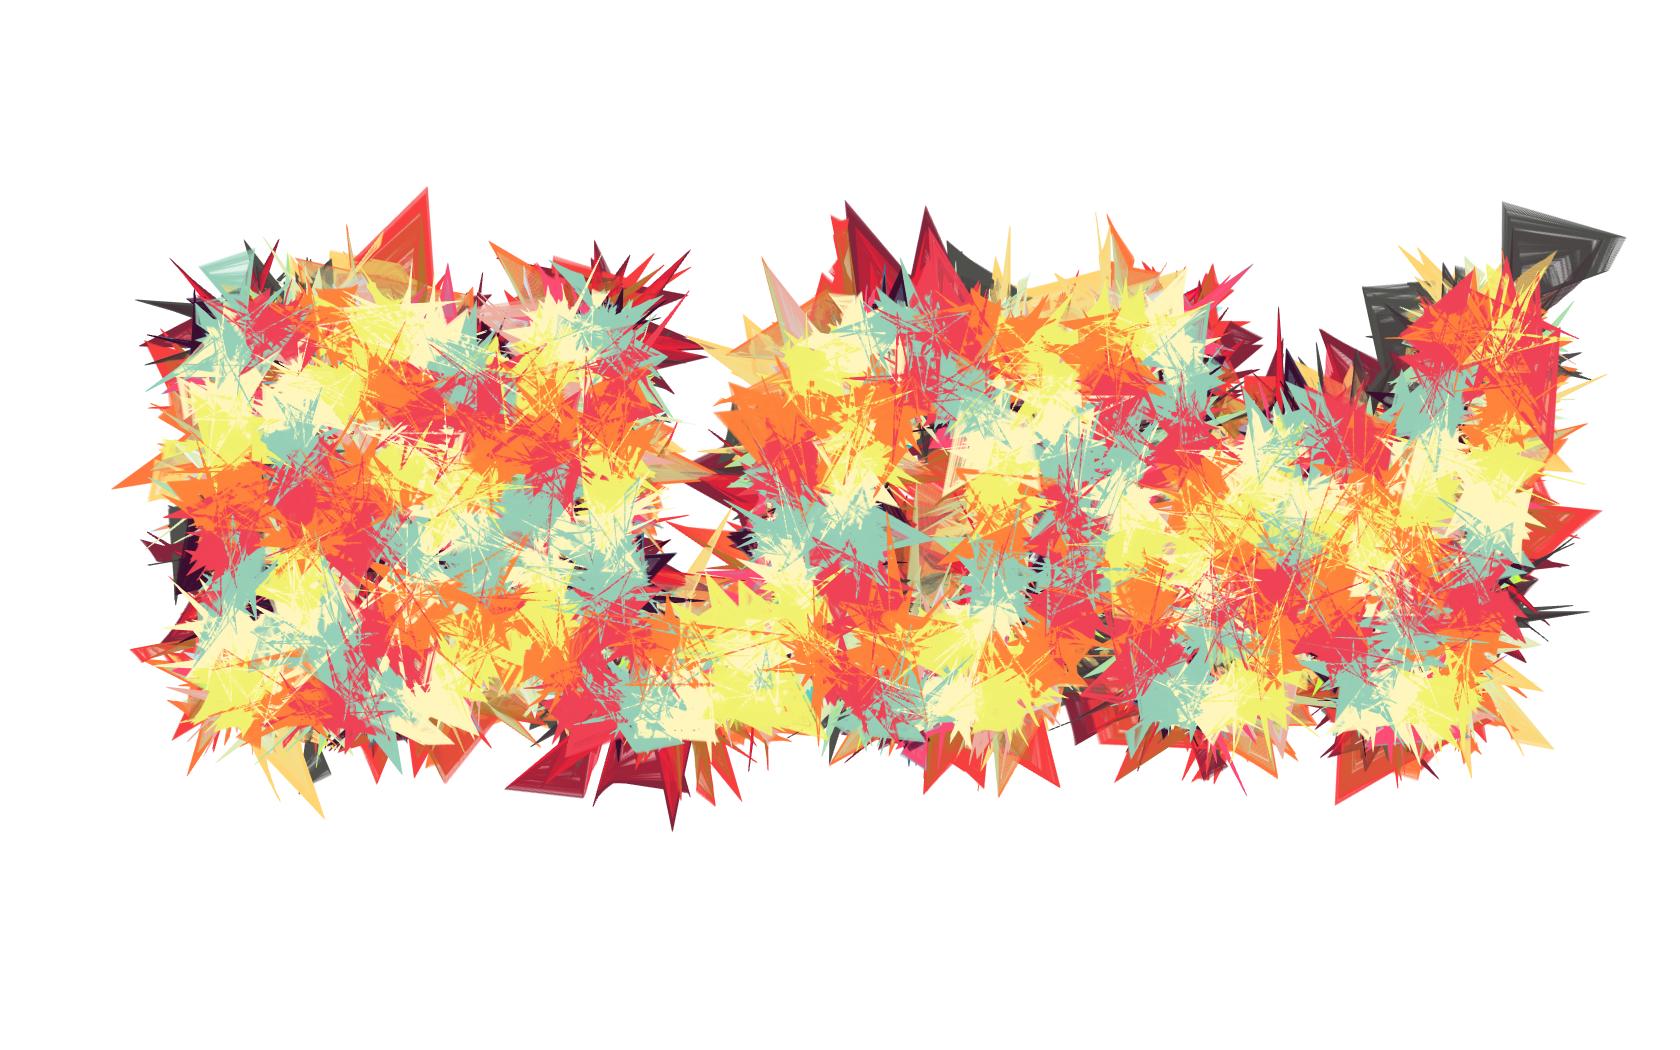 TypoSprings-10-4-2011-18-6-32.png (1680×1050)